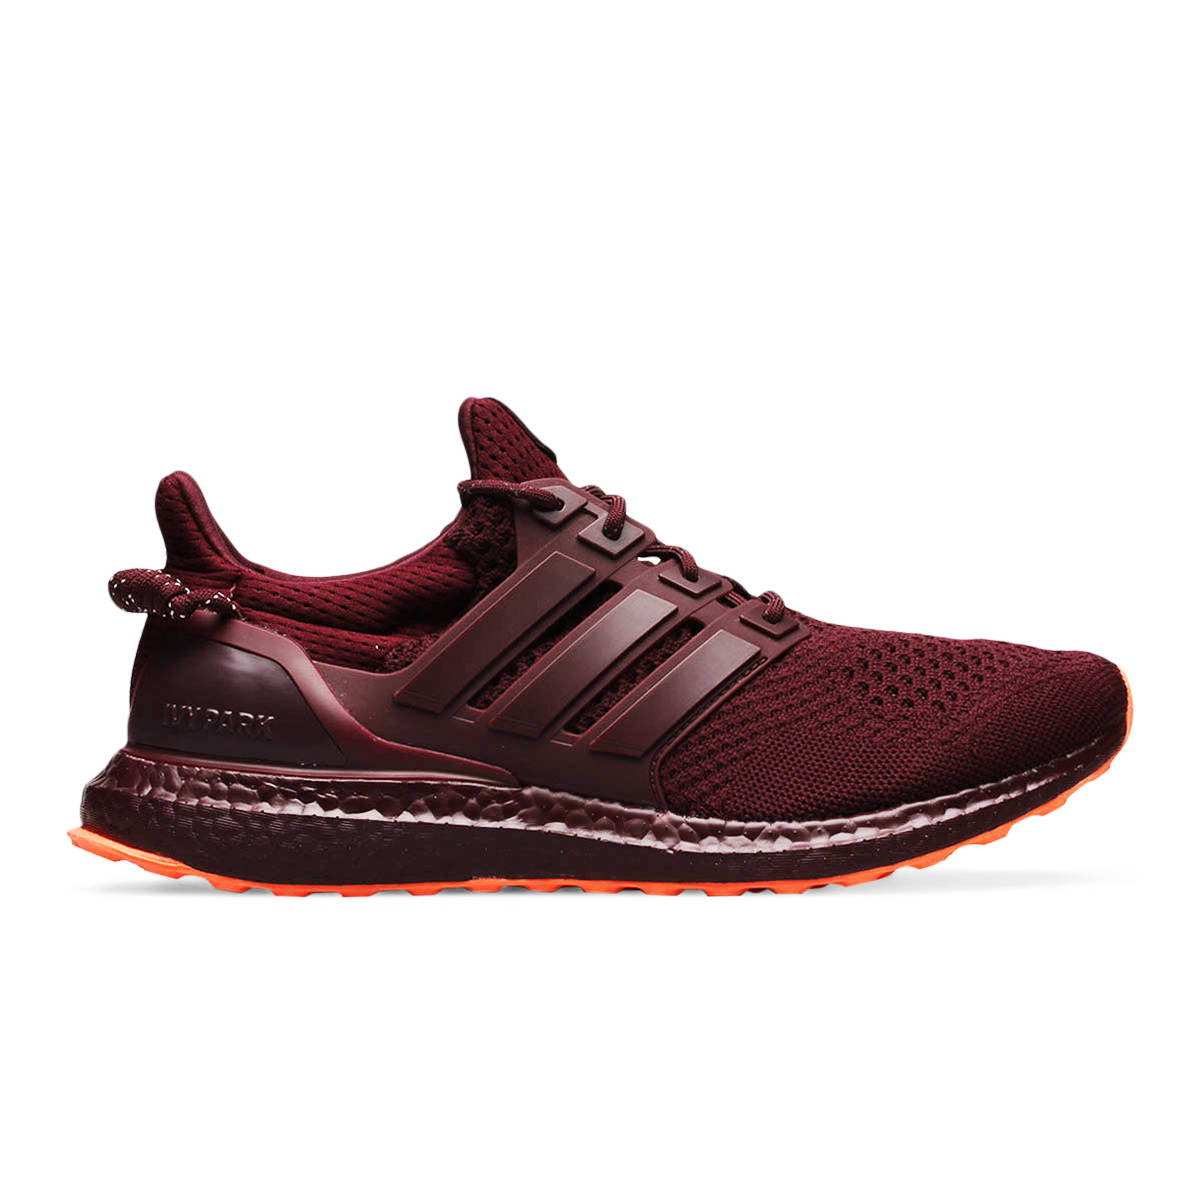 1 18 20 Adidas Ivy Park Ultraboost Qs Bodega